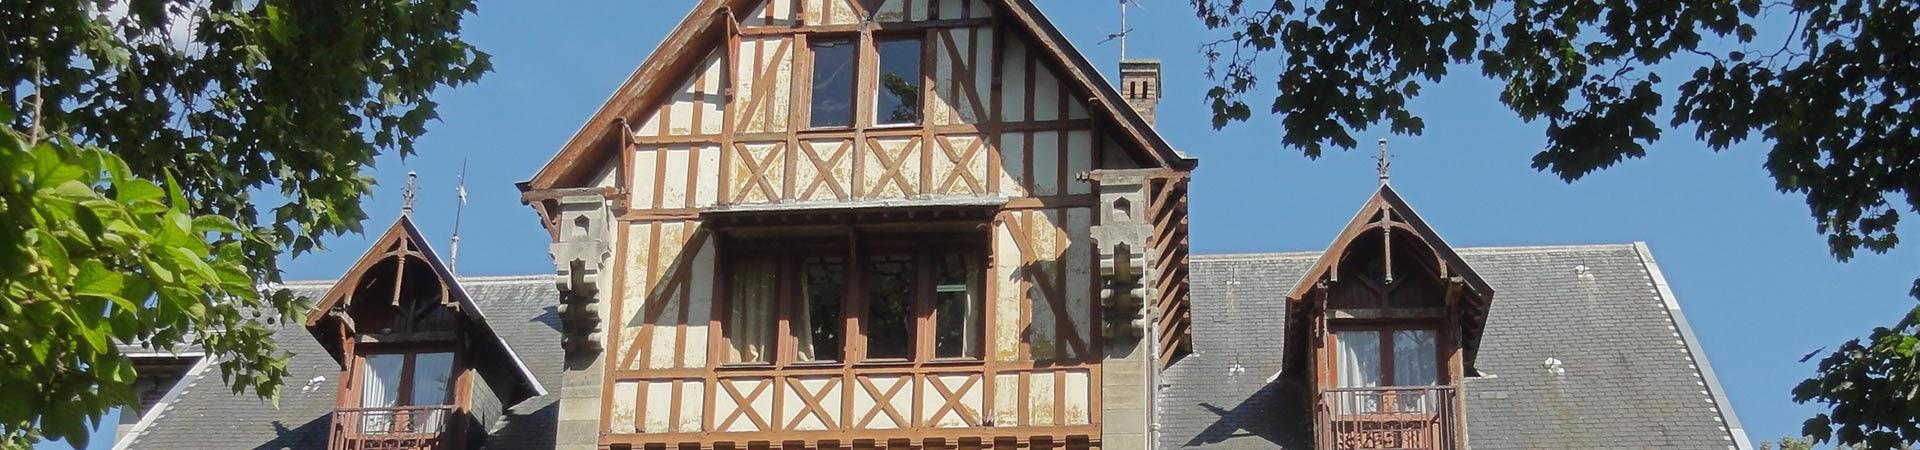 Immobilier Sarcelles